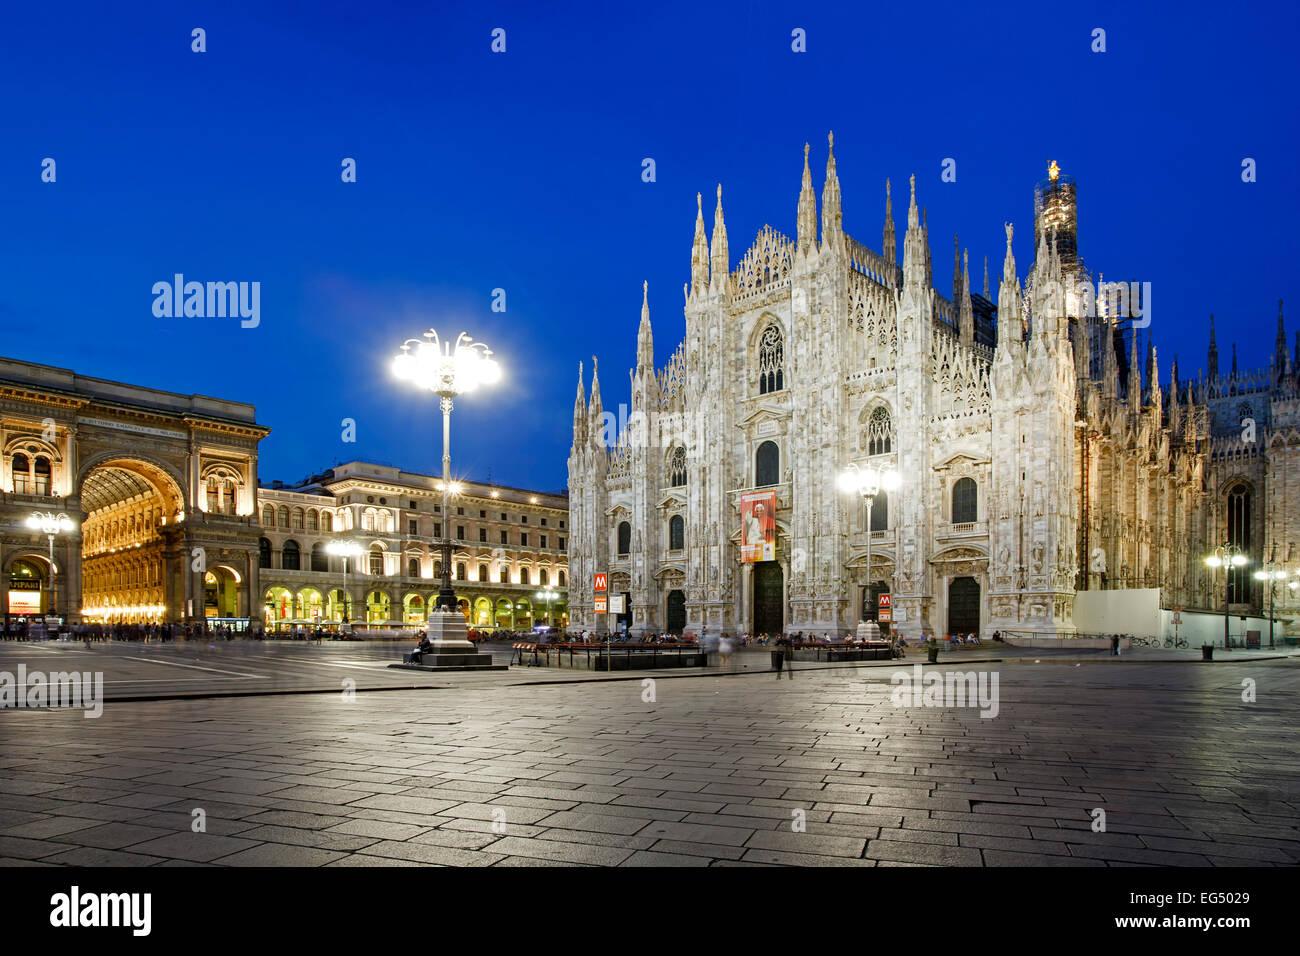 Galleria Vittorio Emanuele (left), and Milan Cathedral (Duomo di Milano) (right), Duomo Square, Milan, Italy - Stock Image